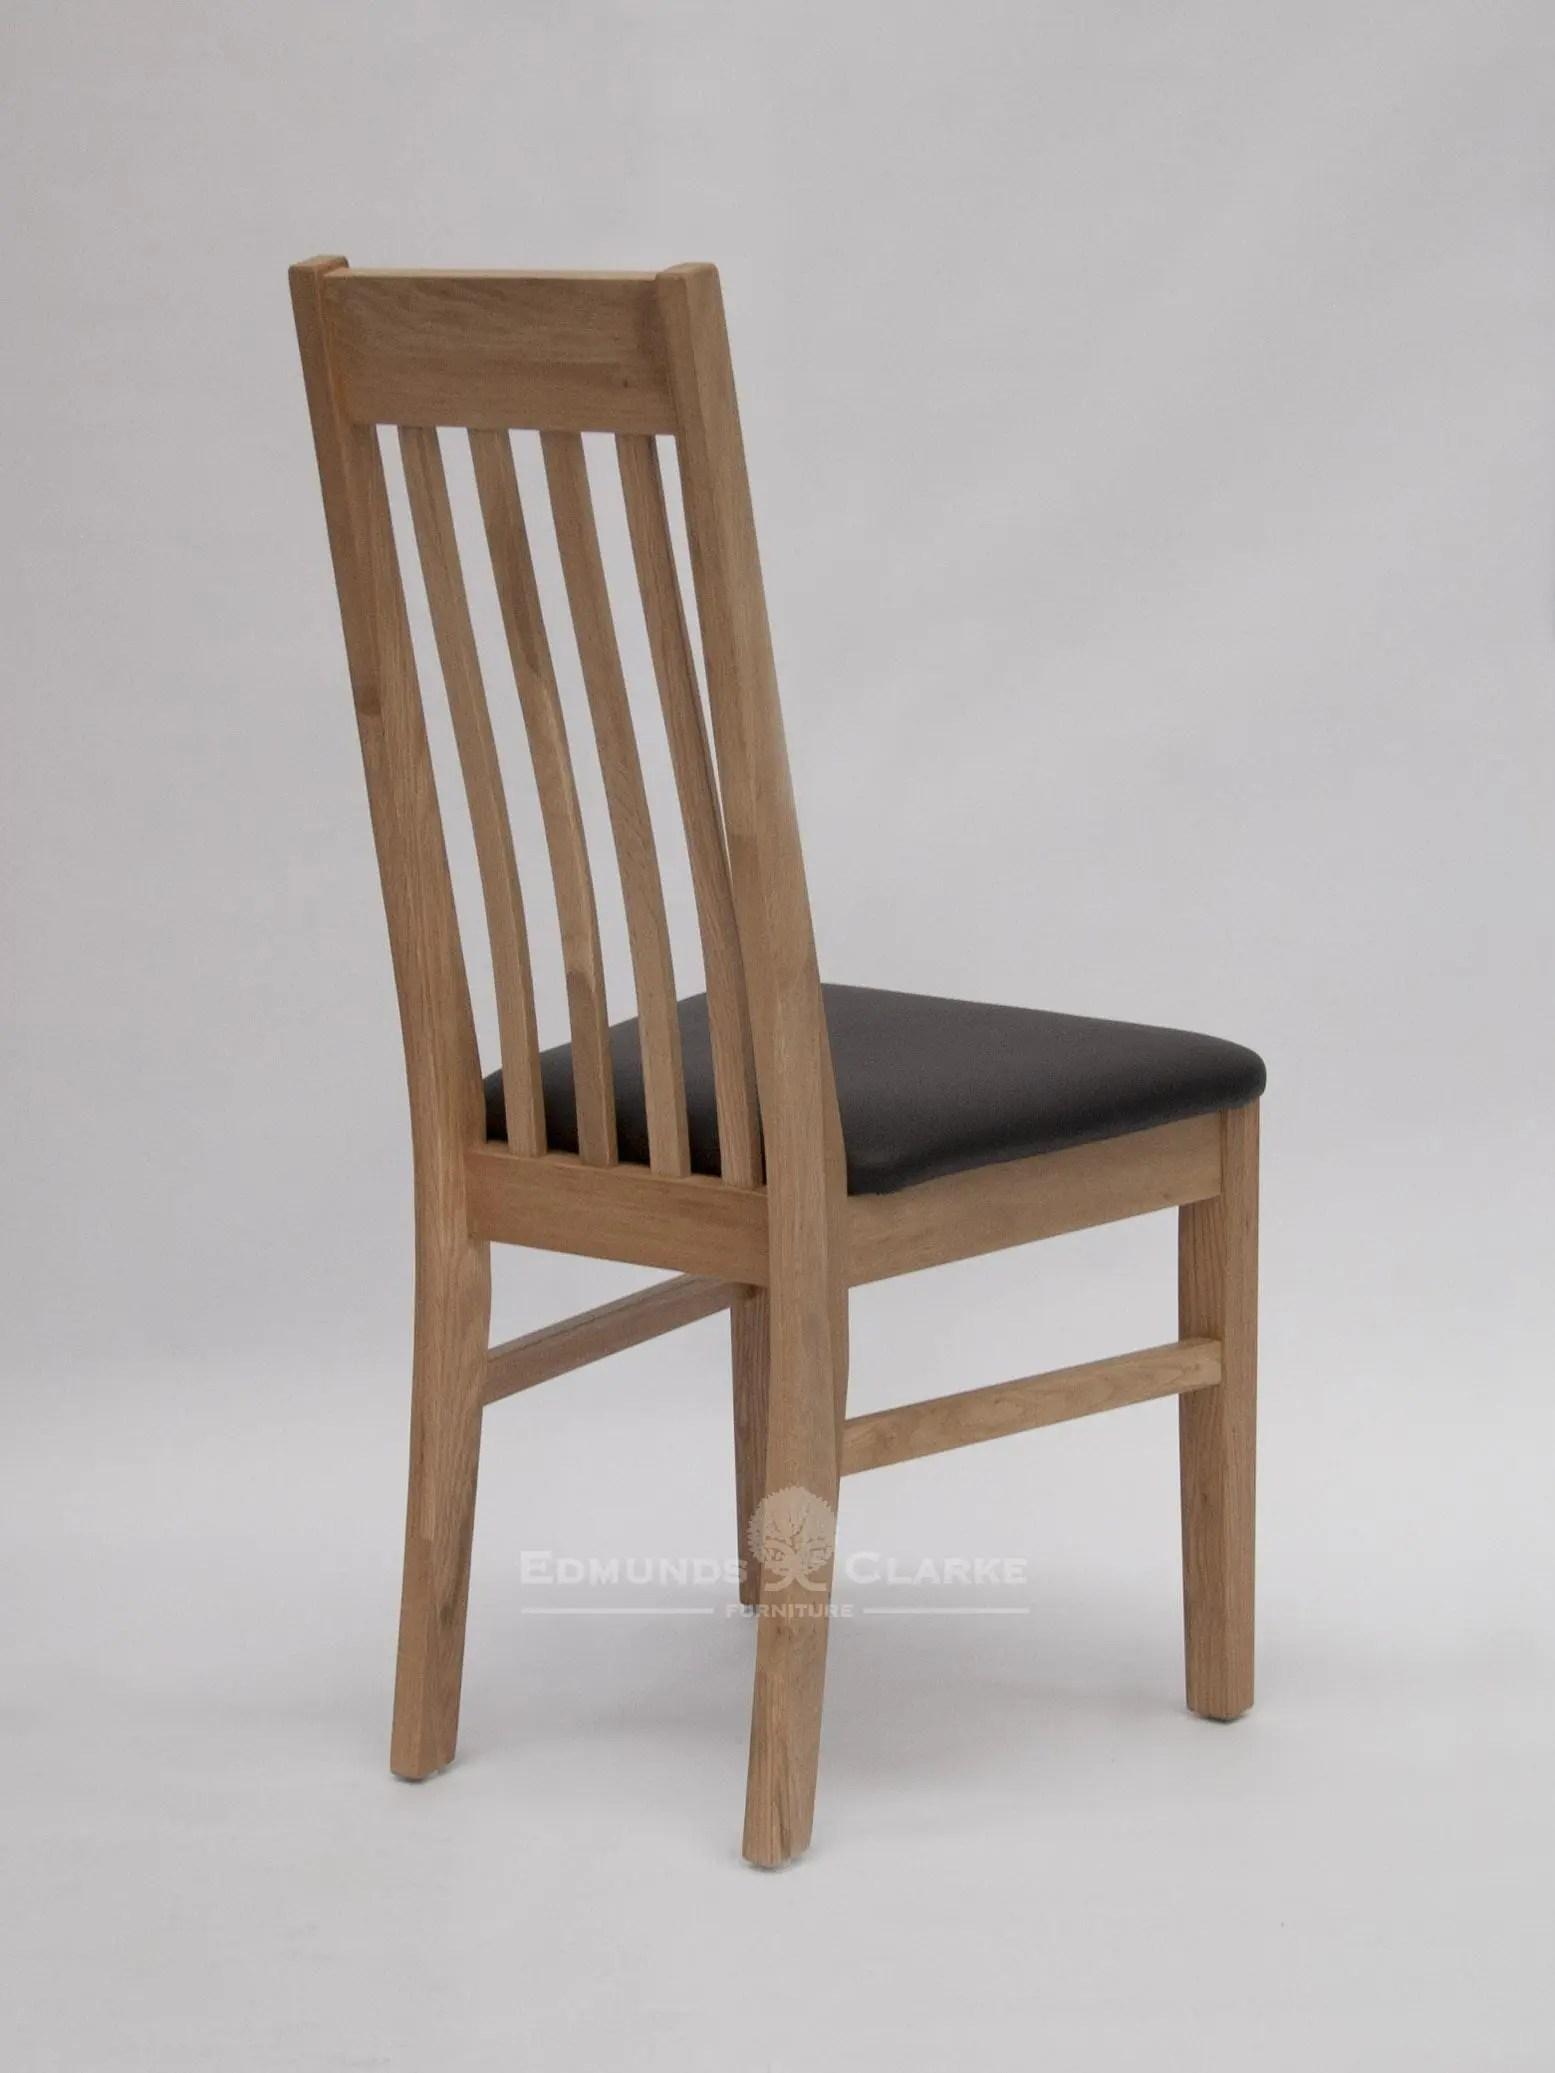 Edmunds and Clarke Furniture & Sophia Oak Dining Chair